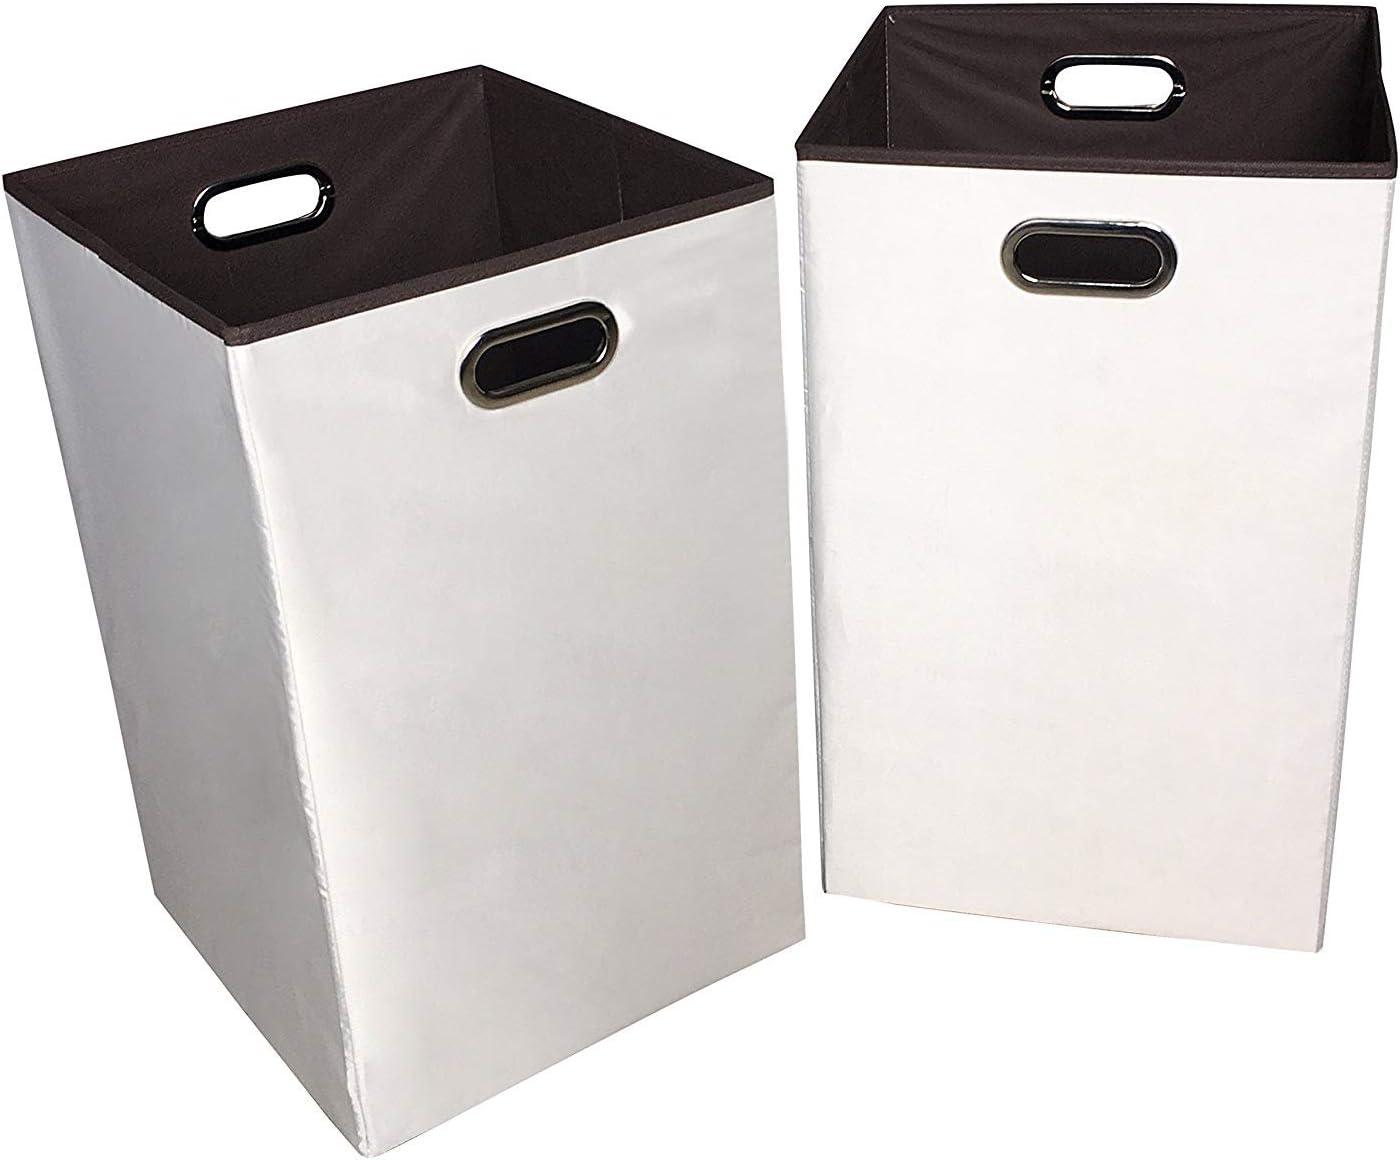 "Sodynee 2-Pack 23"" Closet Folding Laundry Clothes Hamper Sorter Basket Bin,Beige with Brown Interior"